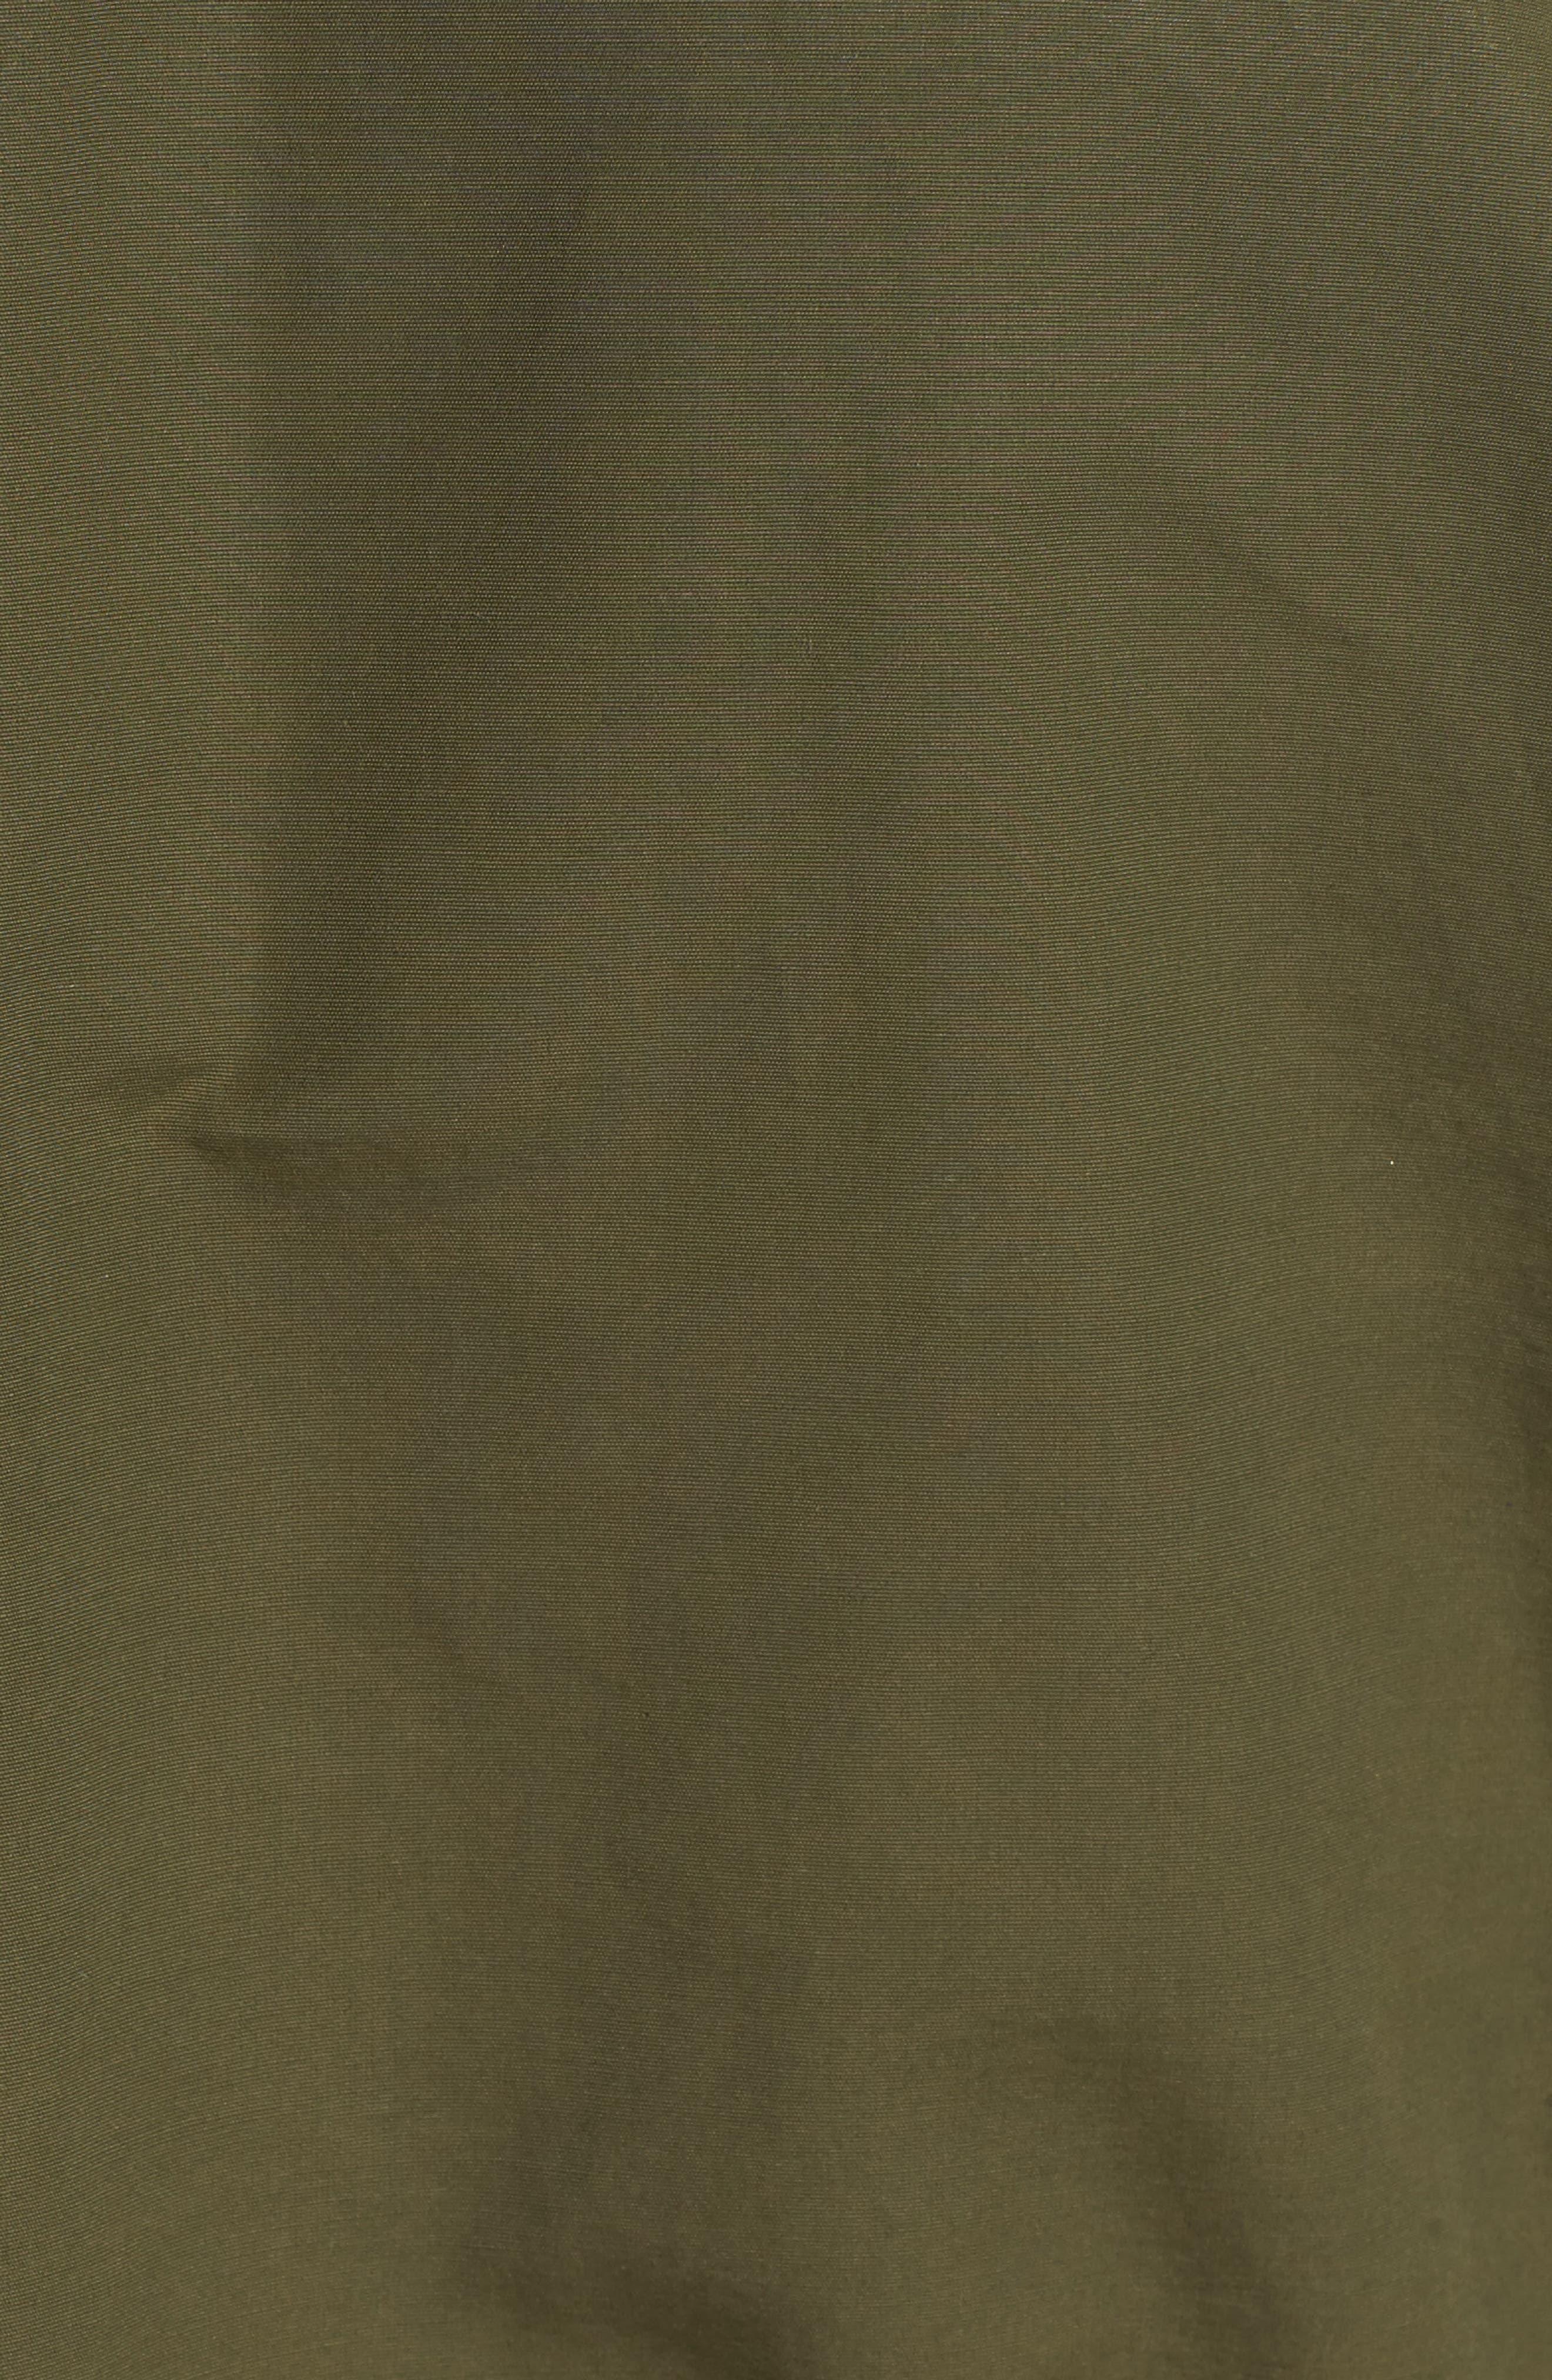 Military Field Jacket,                             Alternate thumbnail 6, color,                             313